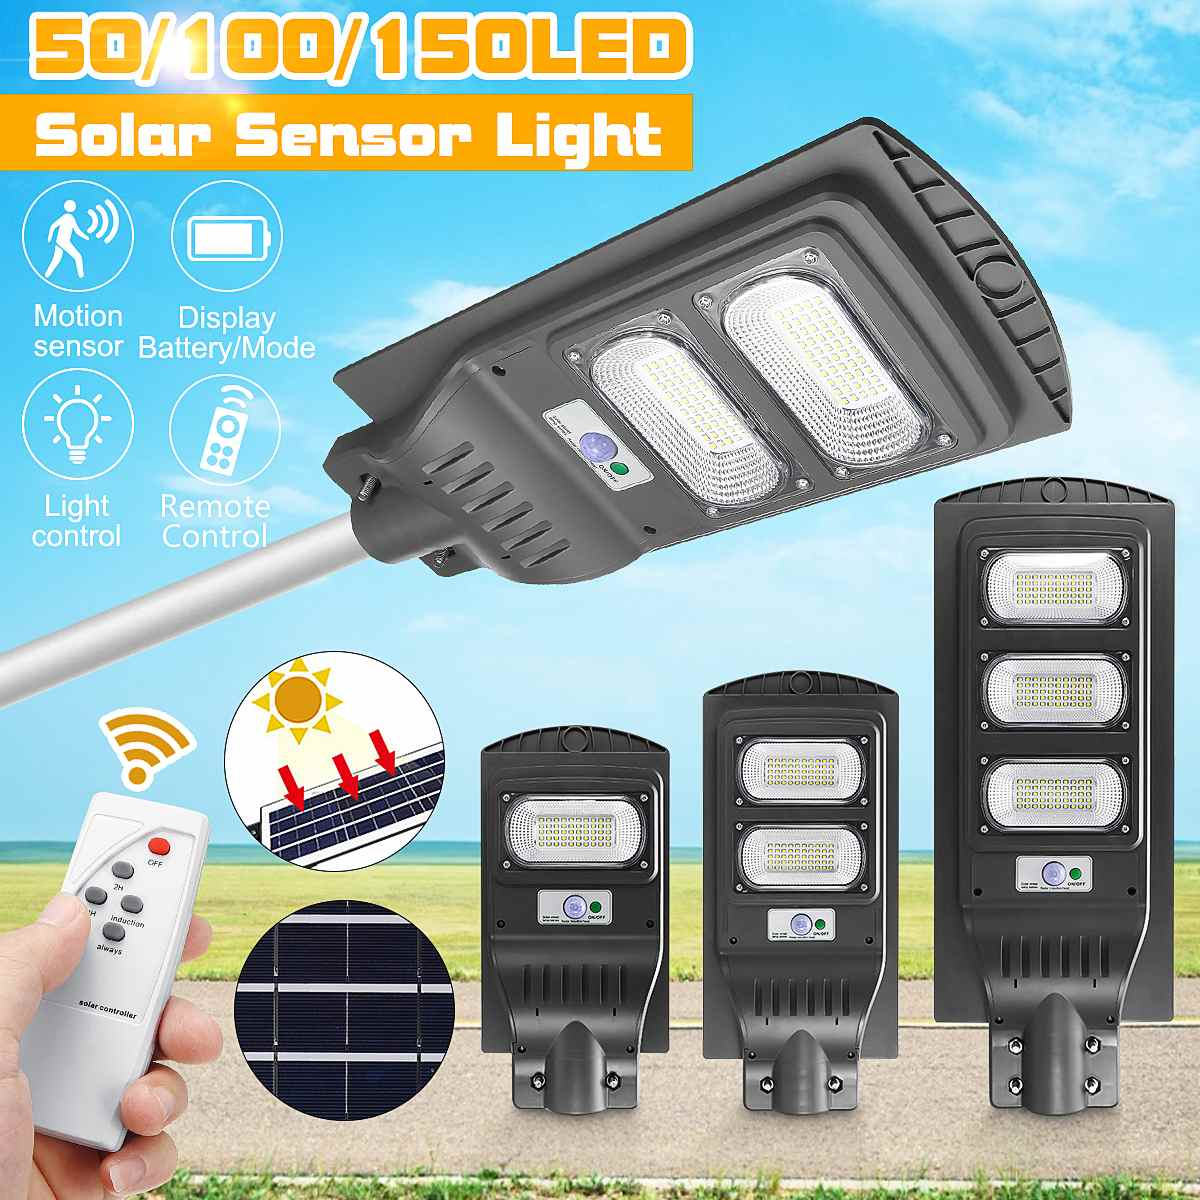 LED Street Light 60/90/150W LED Solar Light Radar PIR Motion Sensor Wall Timing Lamp+Remote Waterproof for Plaza Garden Yard